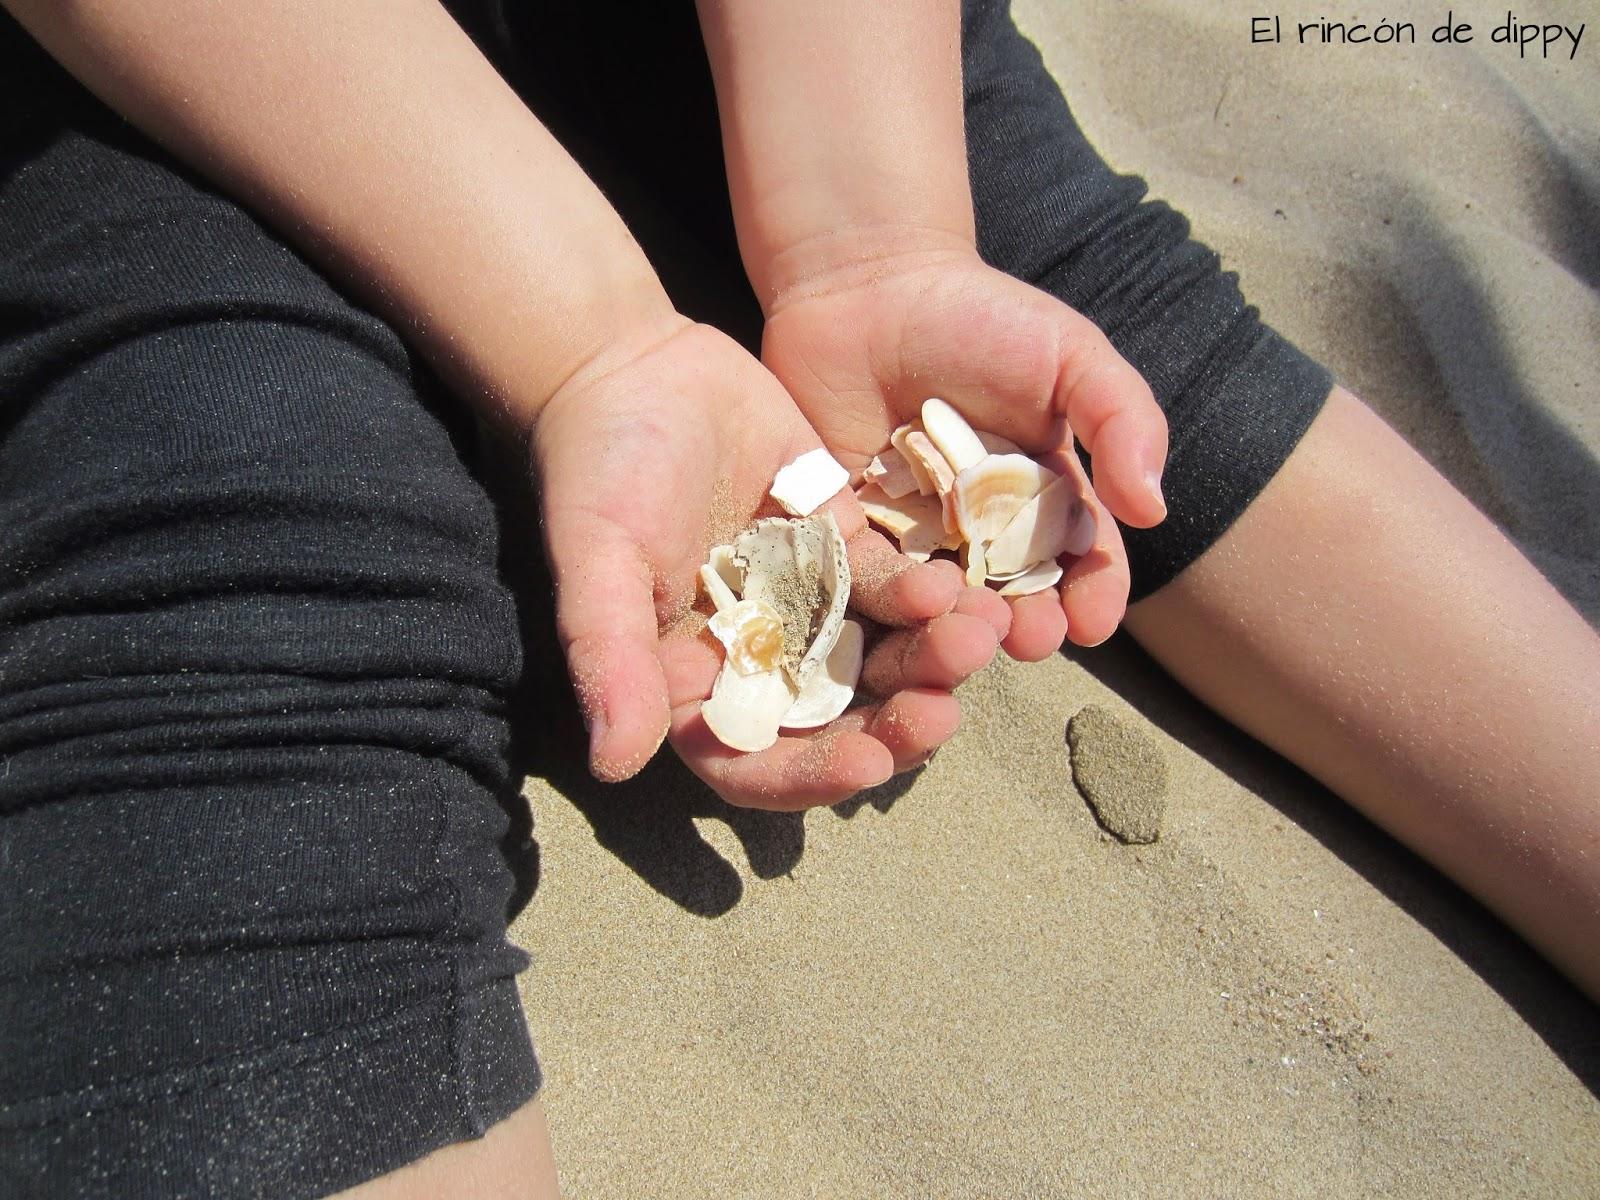 #miercoles-mudo-foto-conchas-playa